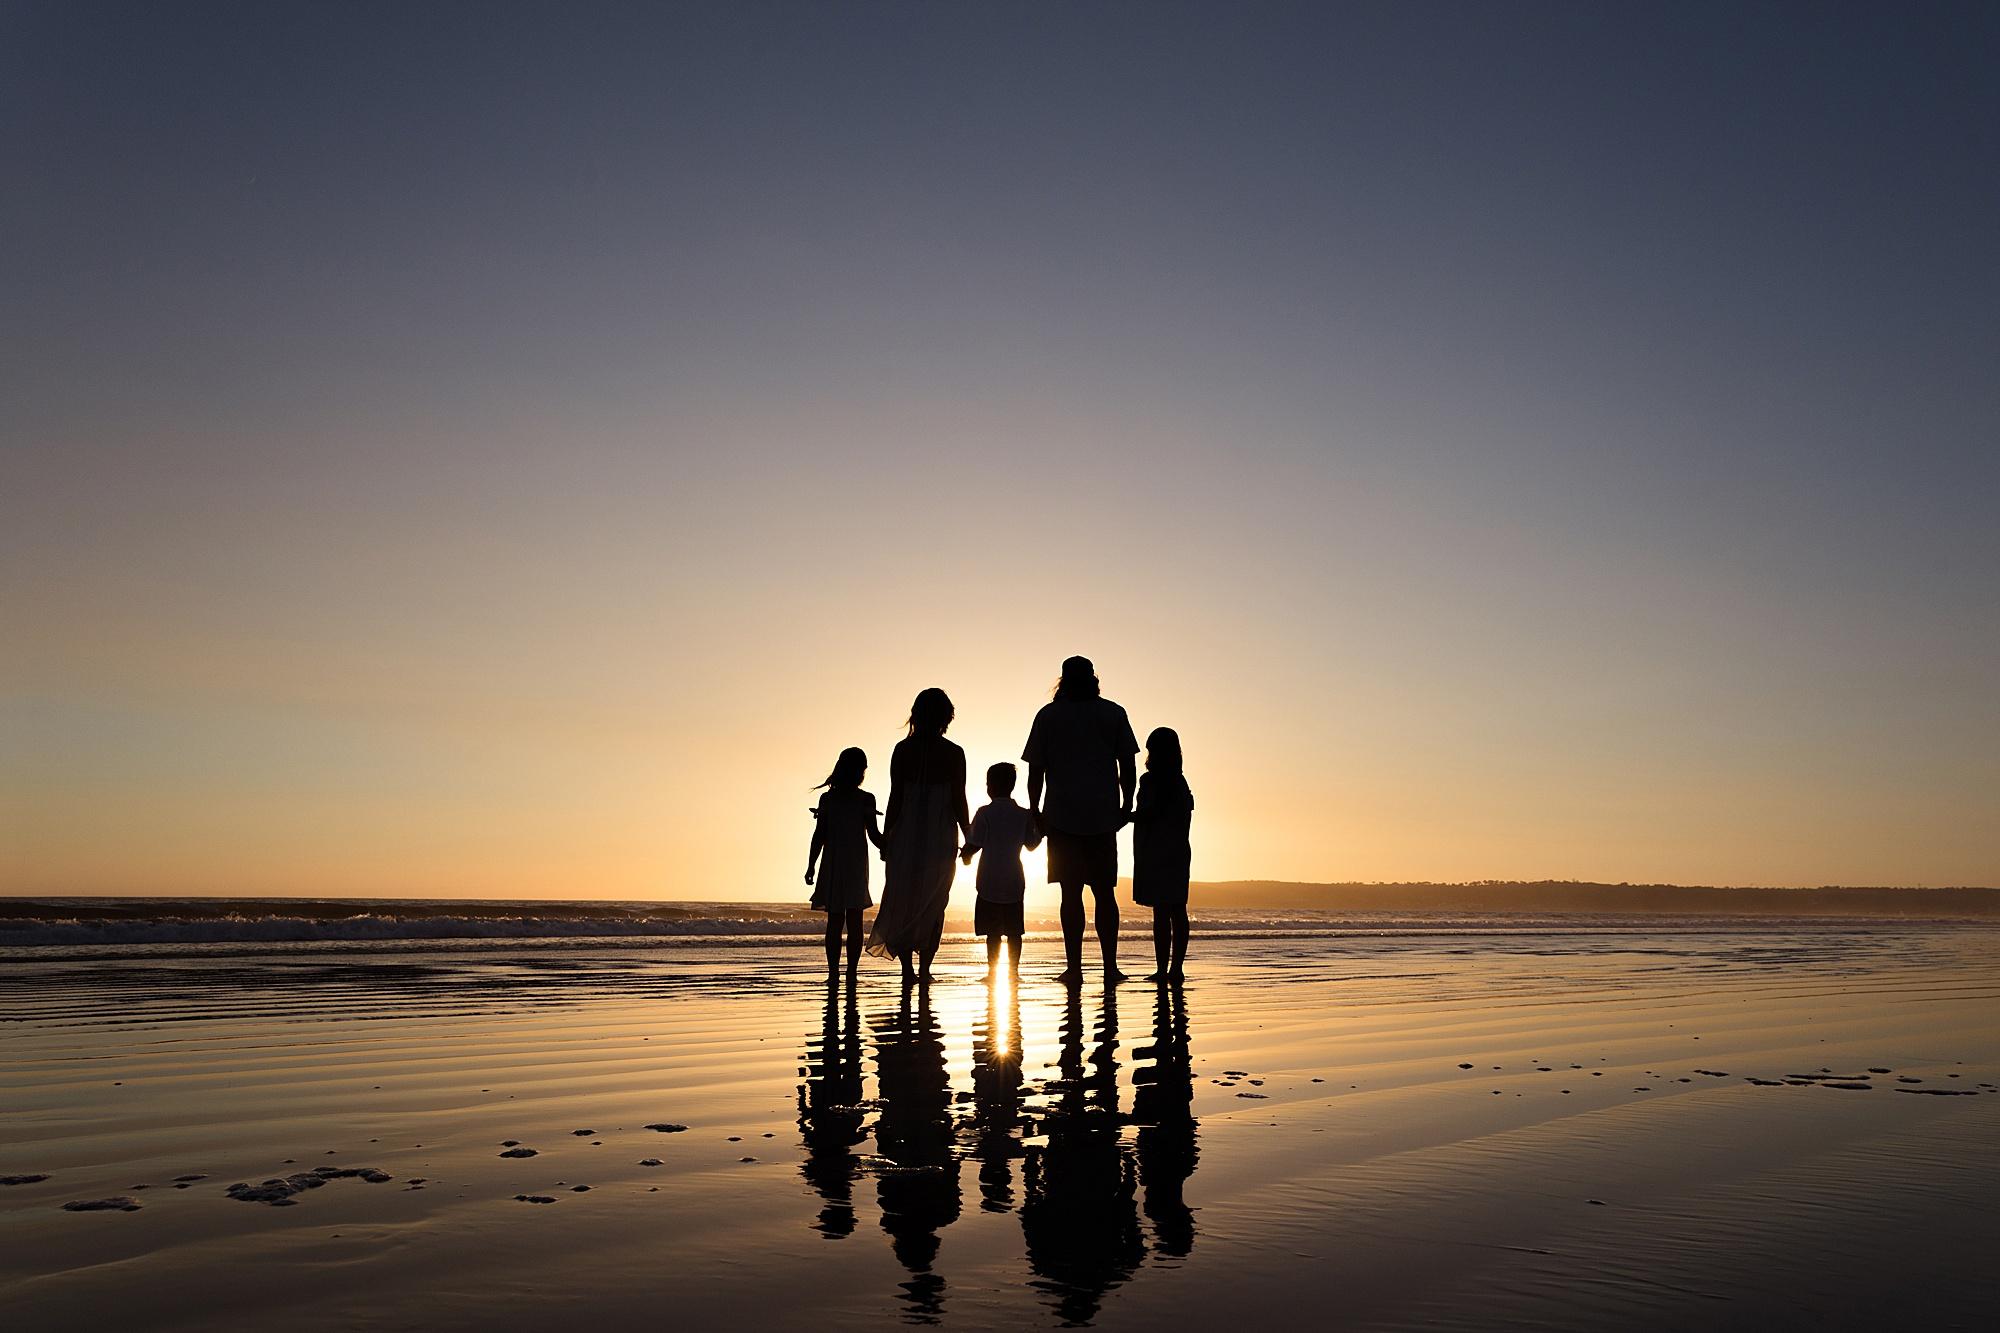 Silhouette Sunset San Diego   San Diego Beach Photography